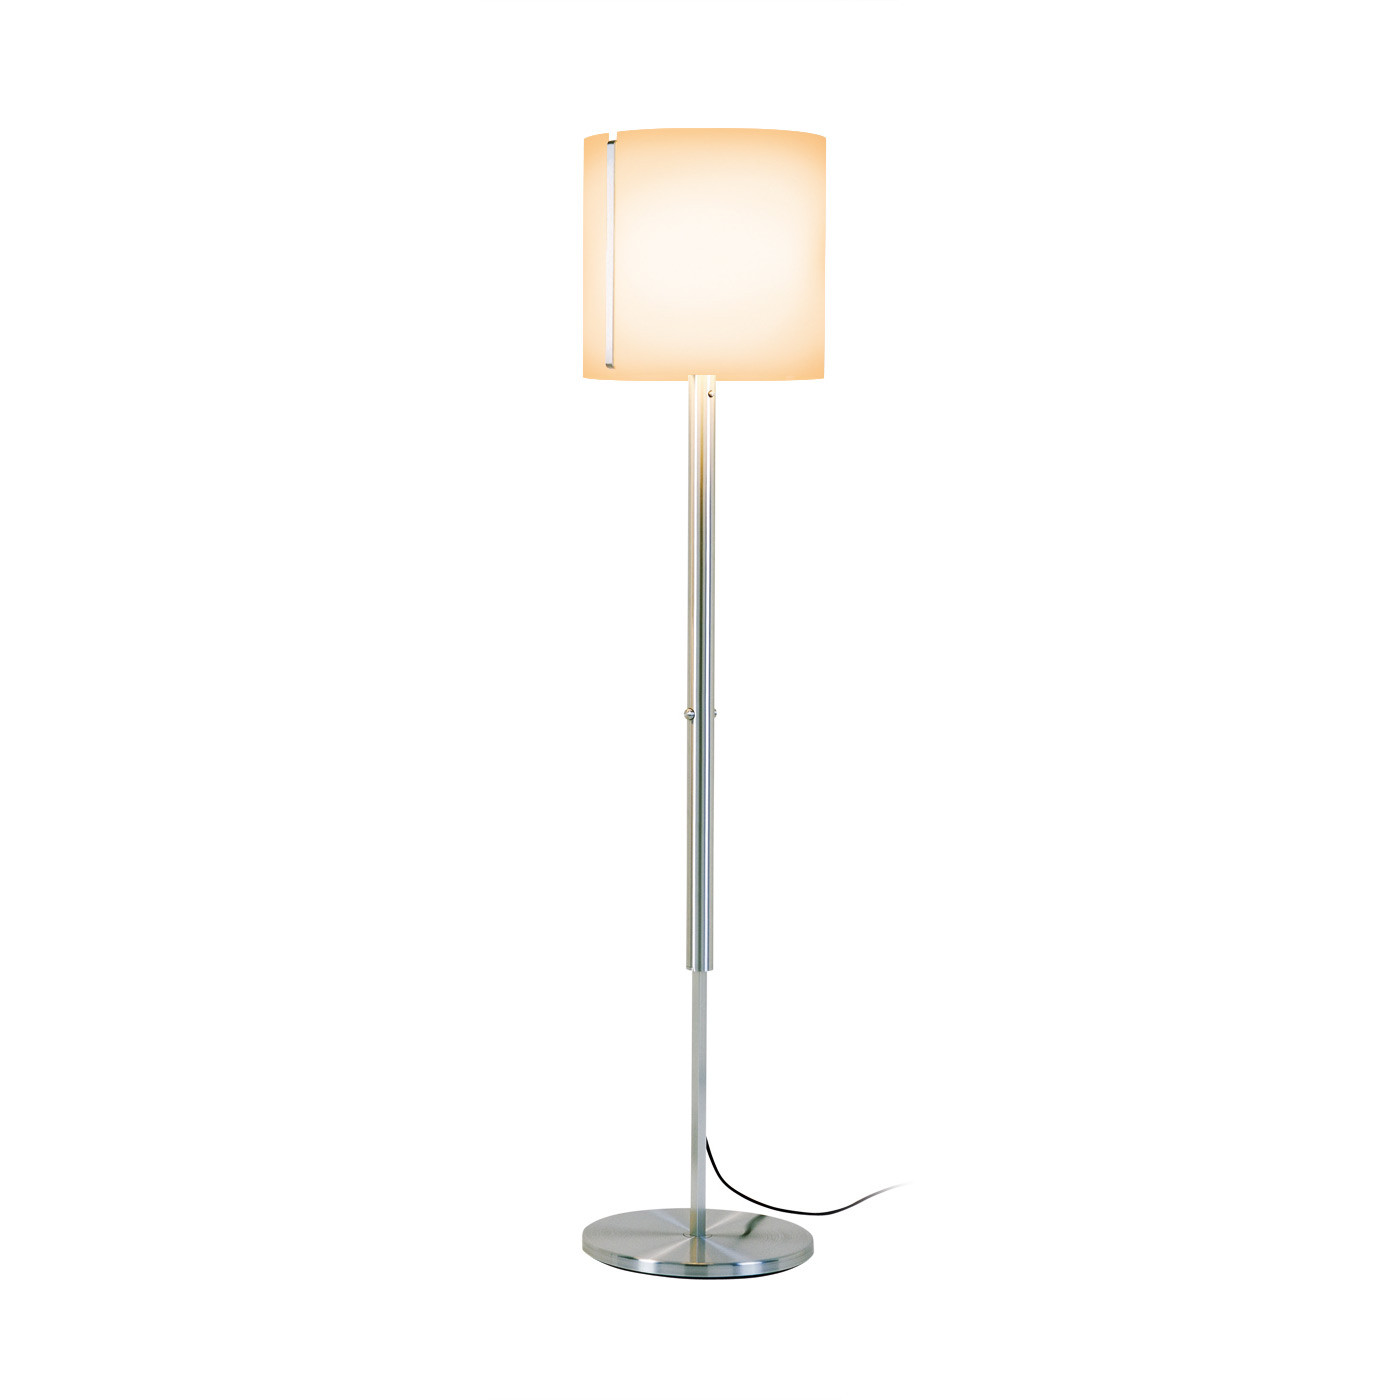 Serien Lighting Jones Floor LED